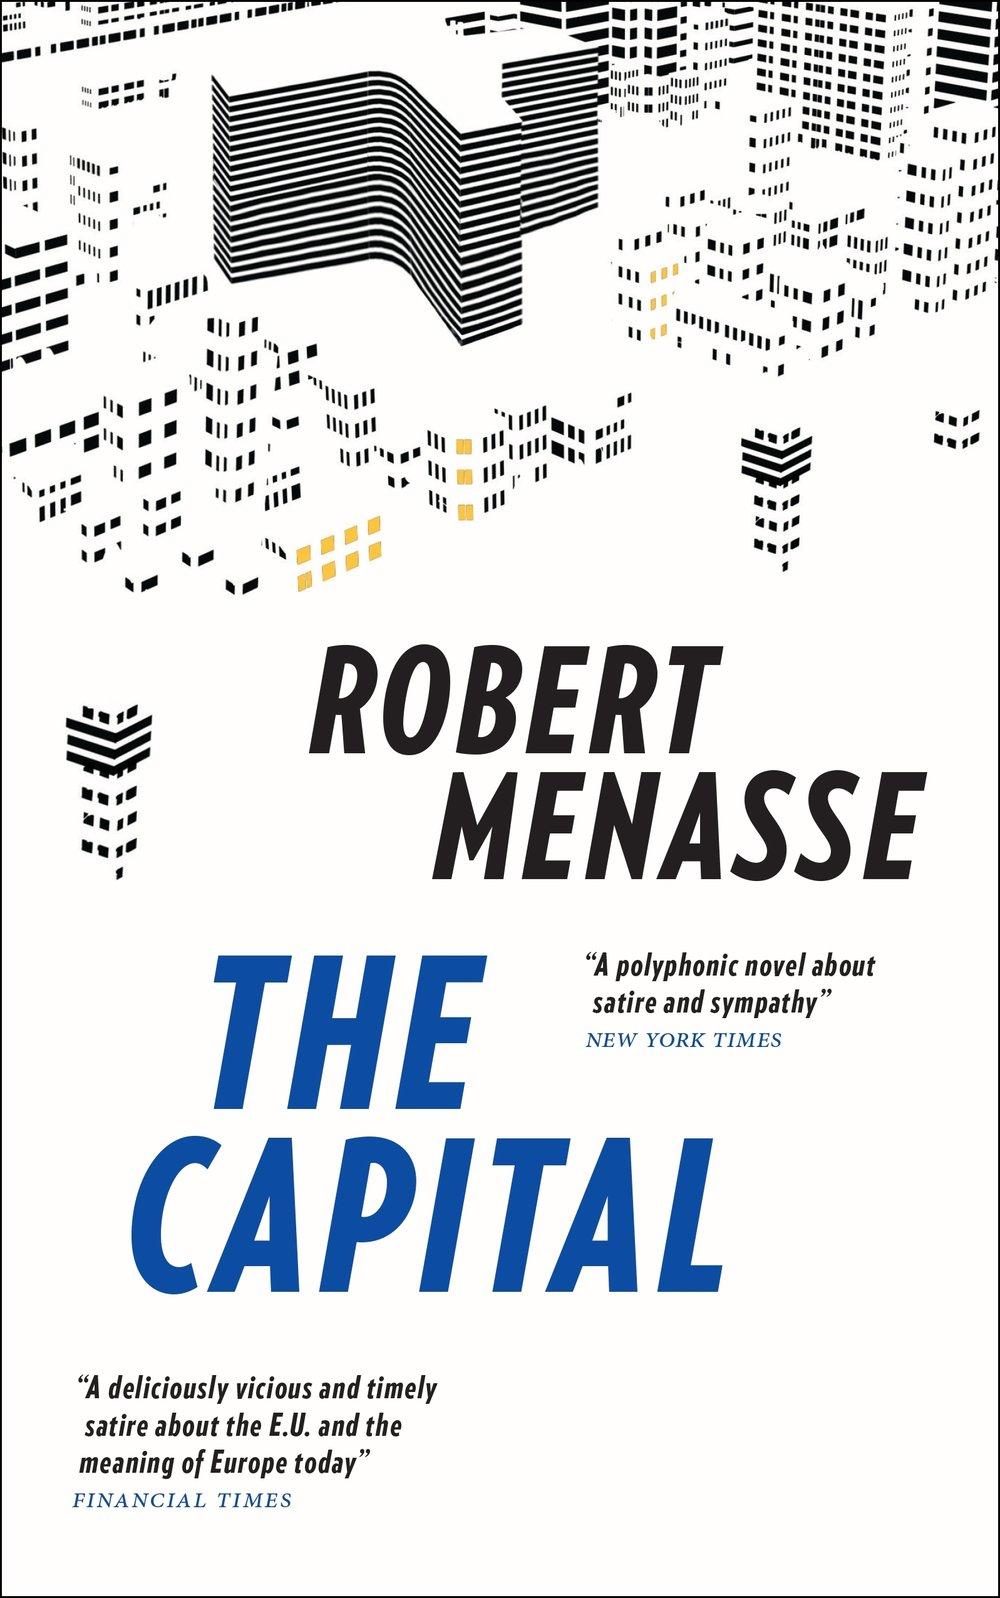 The Capital  by  Robert Menasse  tr.  Jamie Bulloch  (MacLehose, Feb. 2019; Liveright, June 2019)   Reviewed by Jeffrey Zuckerman